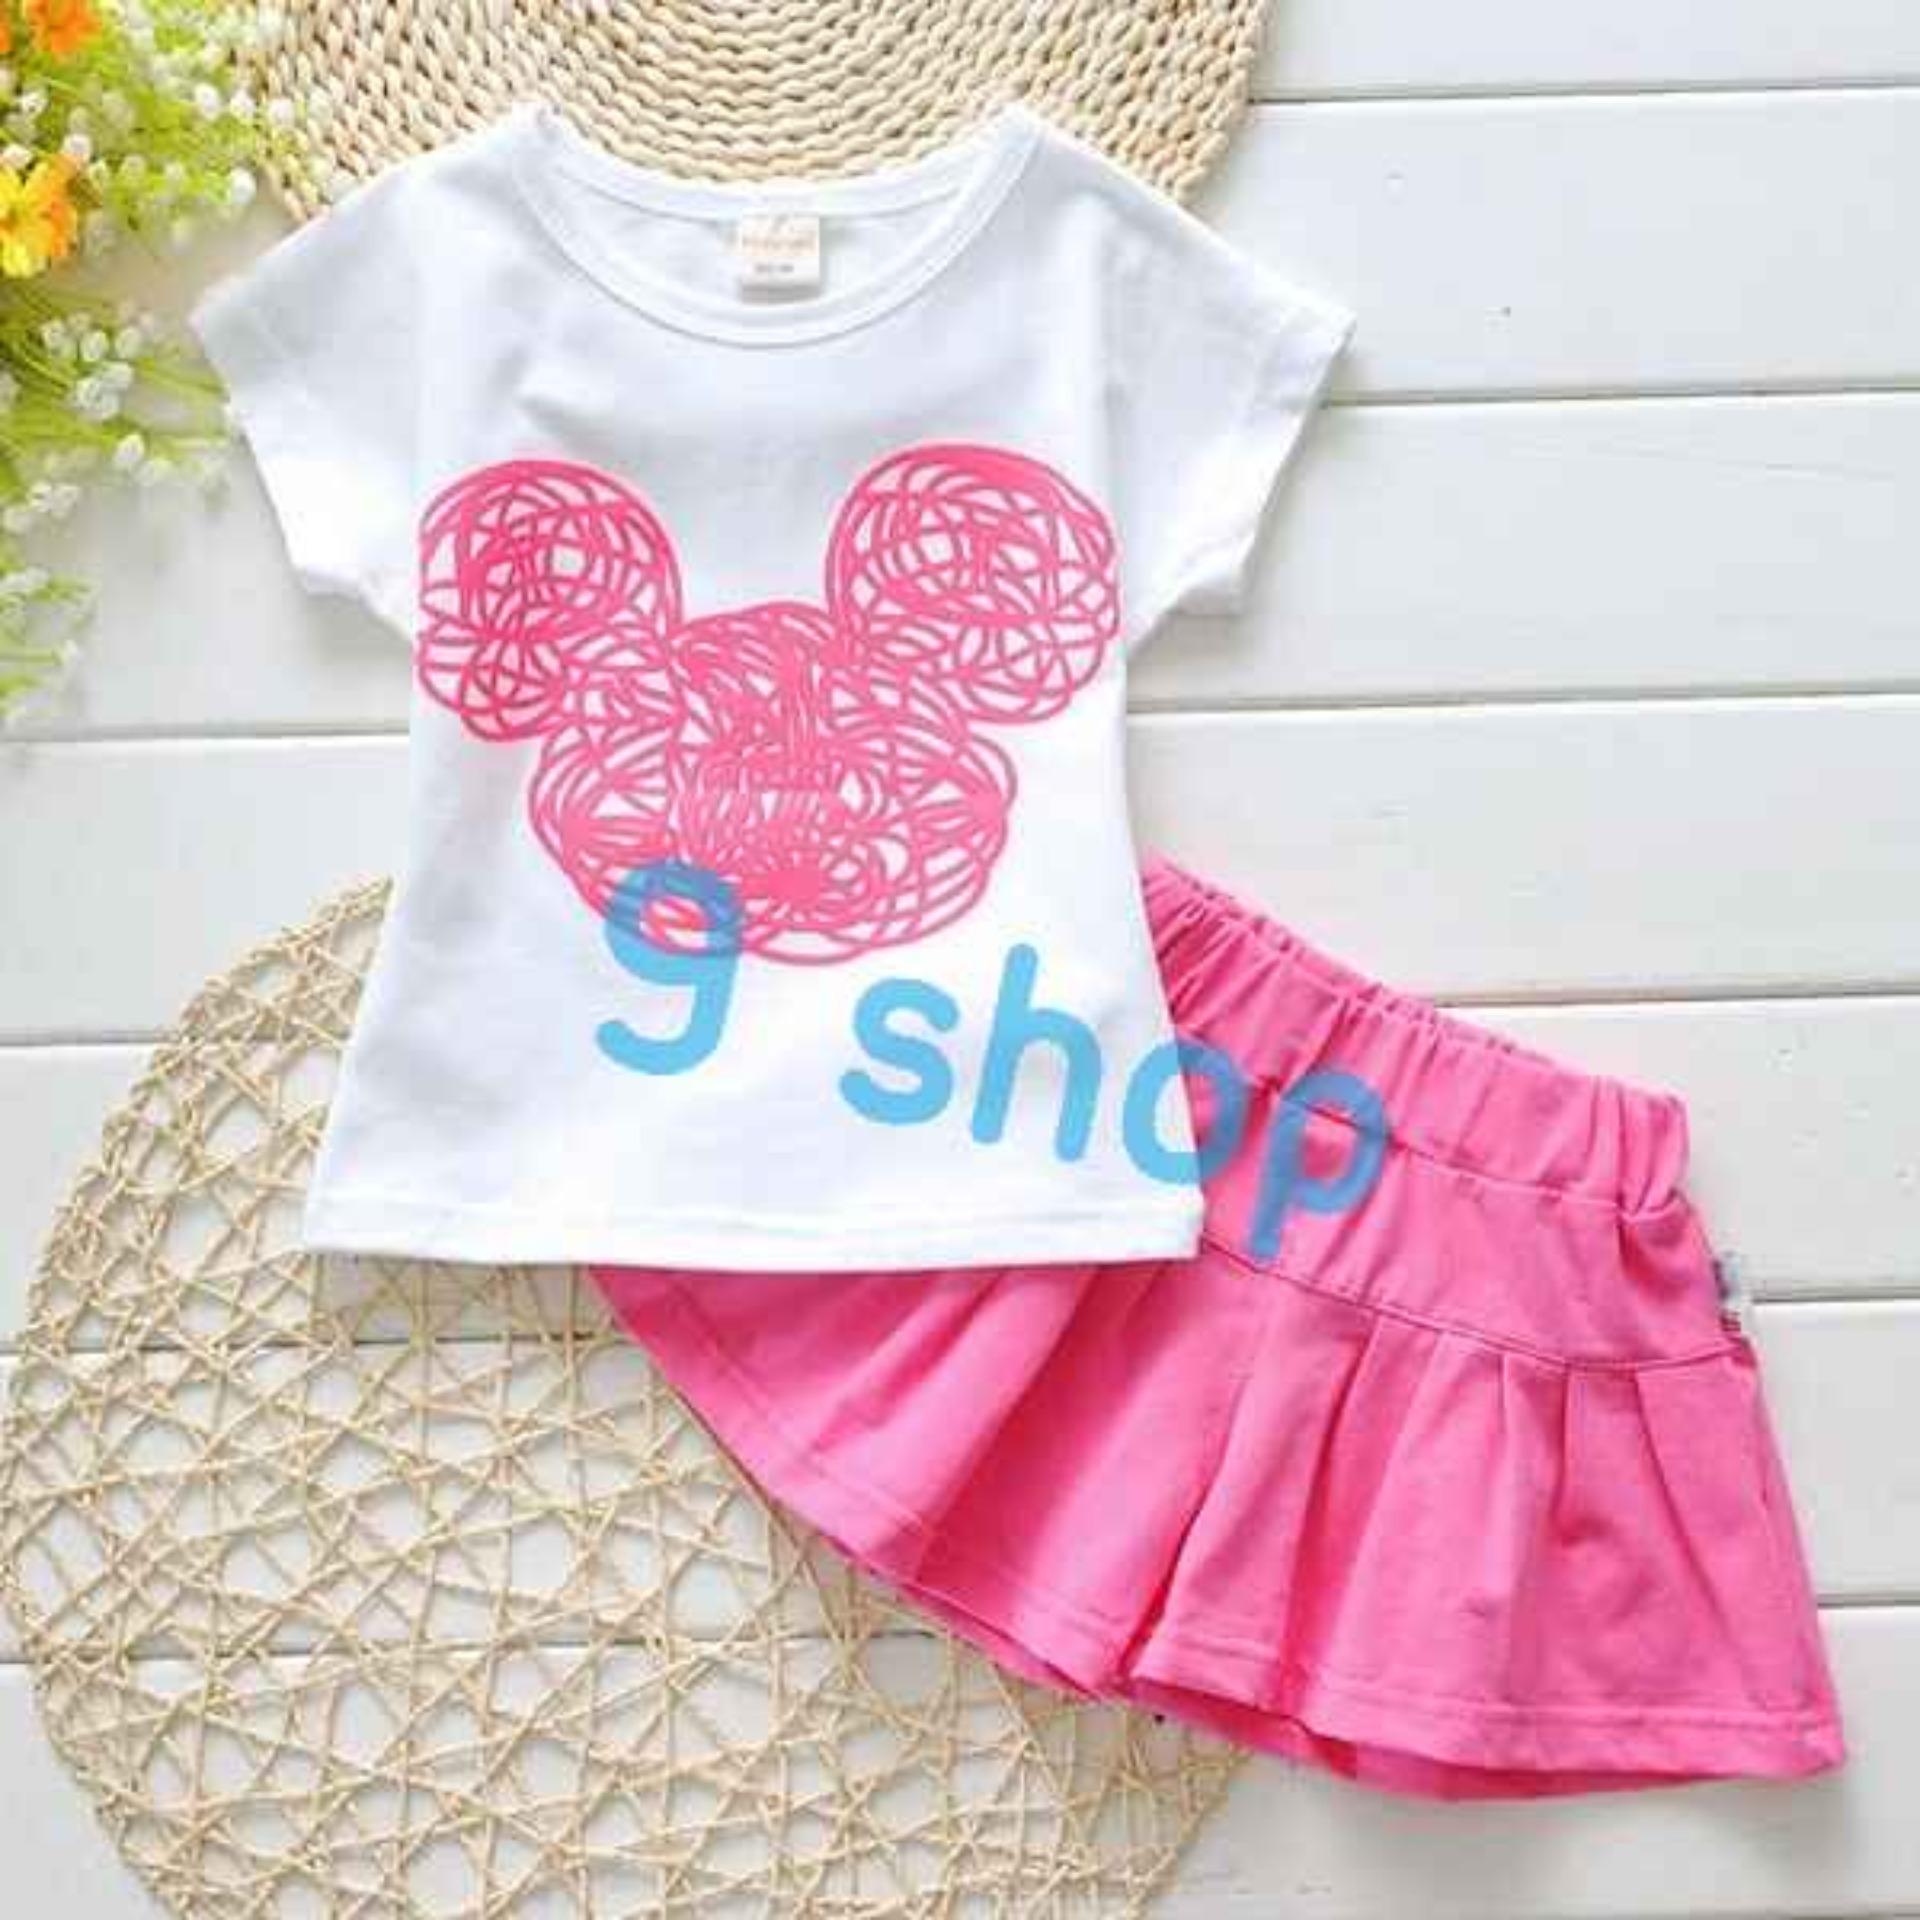 9 Shop Setelan Baju dan Rok Anak Perempun MICKY / Stelan Baju Anak Perempuan / Stelan Anak Cewek / Baju Anak Perempuan / Rok Anak Perempuan / Setelan Anak Cewek / Setelan Anak Murah / Baju Anak Murah / Stelan Kartun Anak